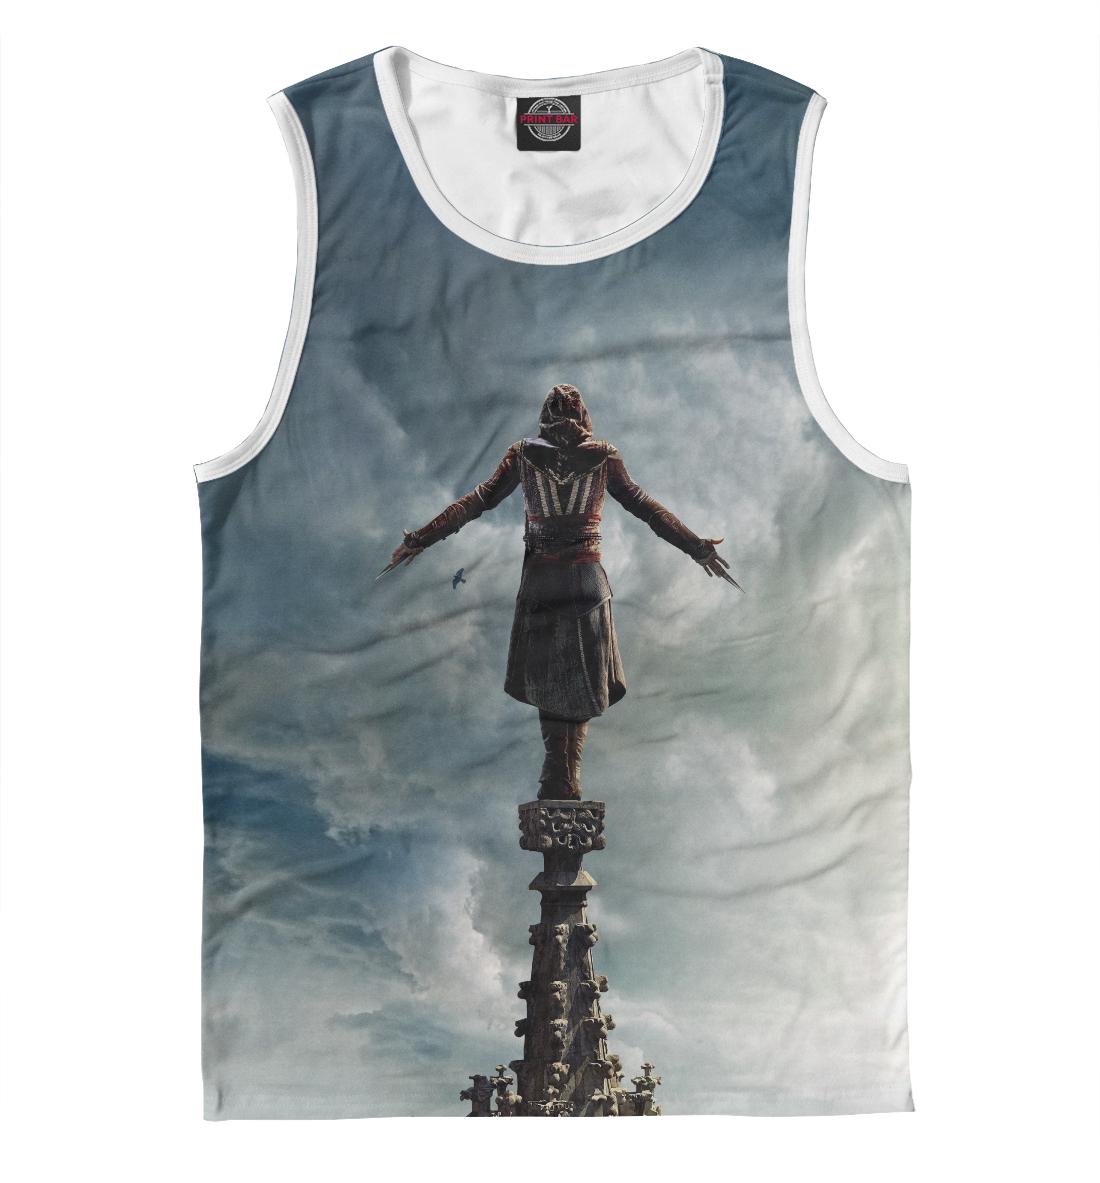 Купить Майка для мальчика Assassin's Creed KNO-232494-may-2